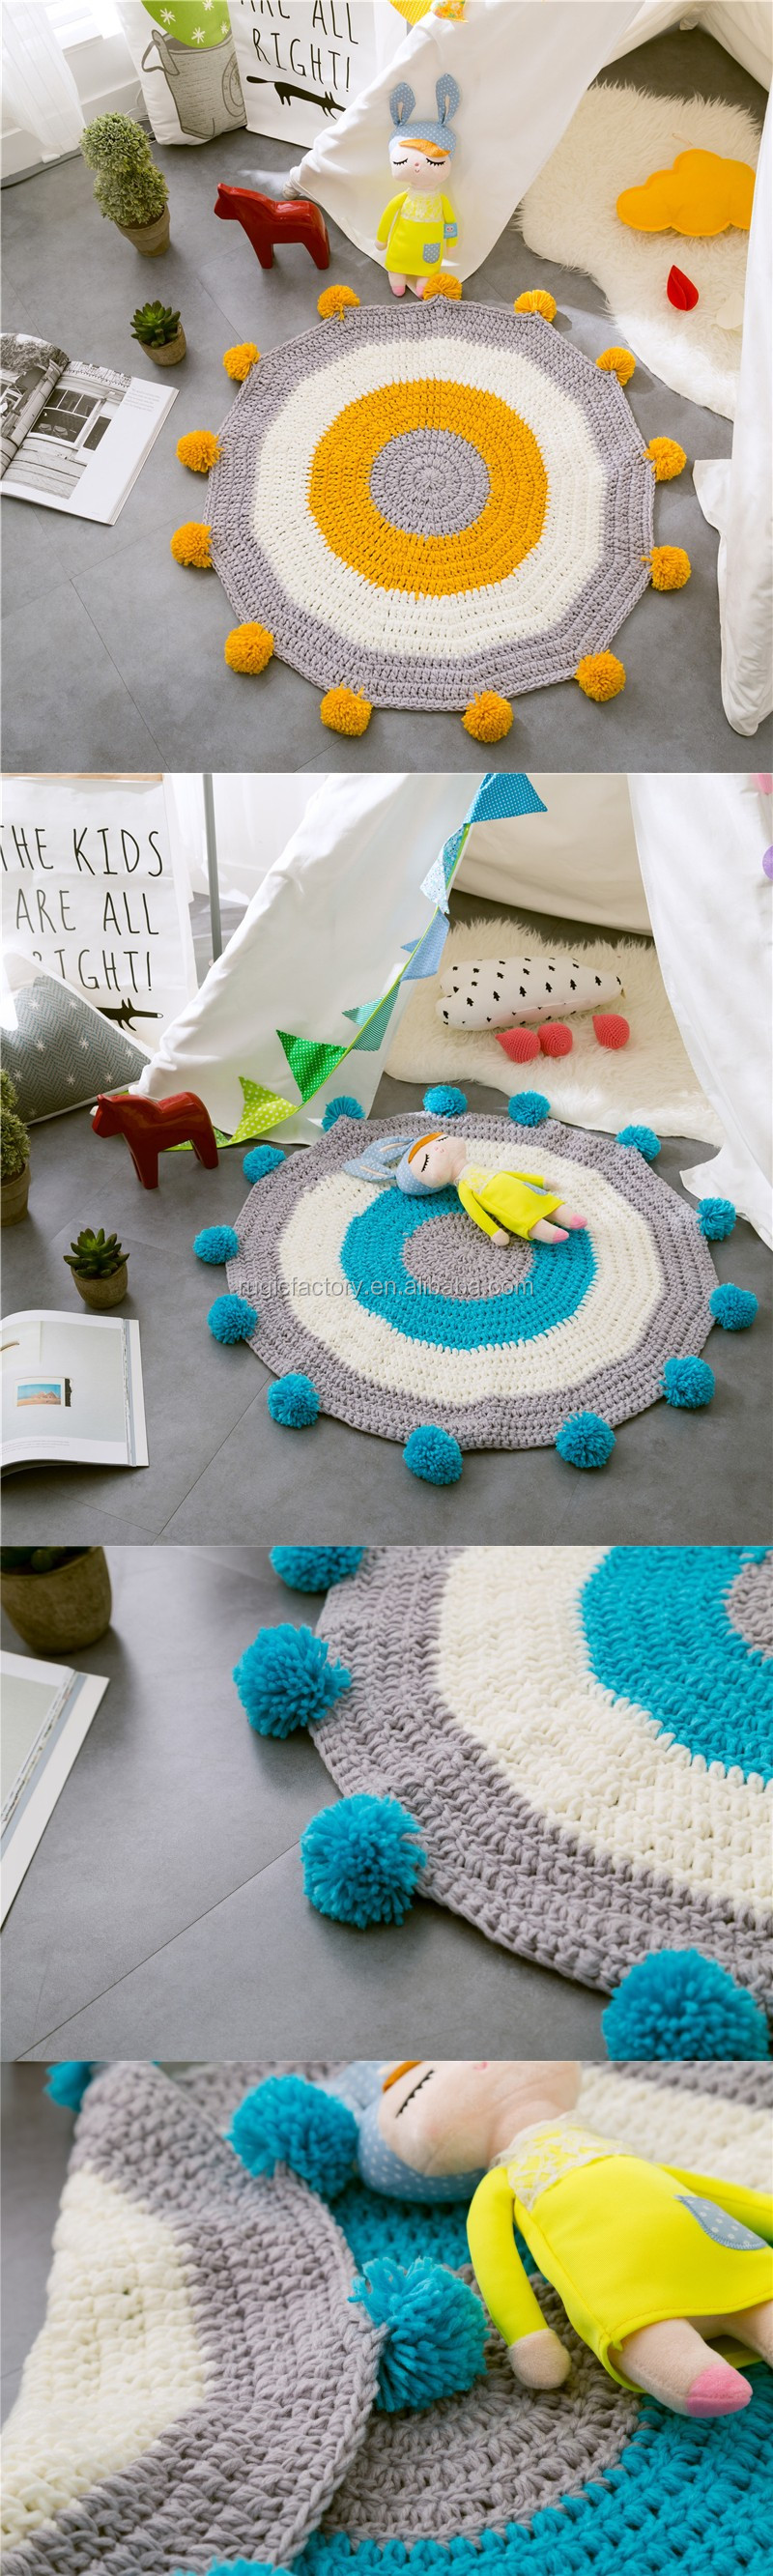 Round 80cm Acrylic Handmade Knitted Mat Kids Floor Crochet Rug Carpet Home Decoration Striped Nordic Style Blanket Buy Kids Floor Rug Hand Knitted Blankets Round Crochet Floor Rug Product On Alibaba Com